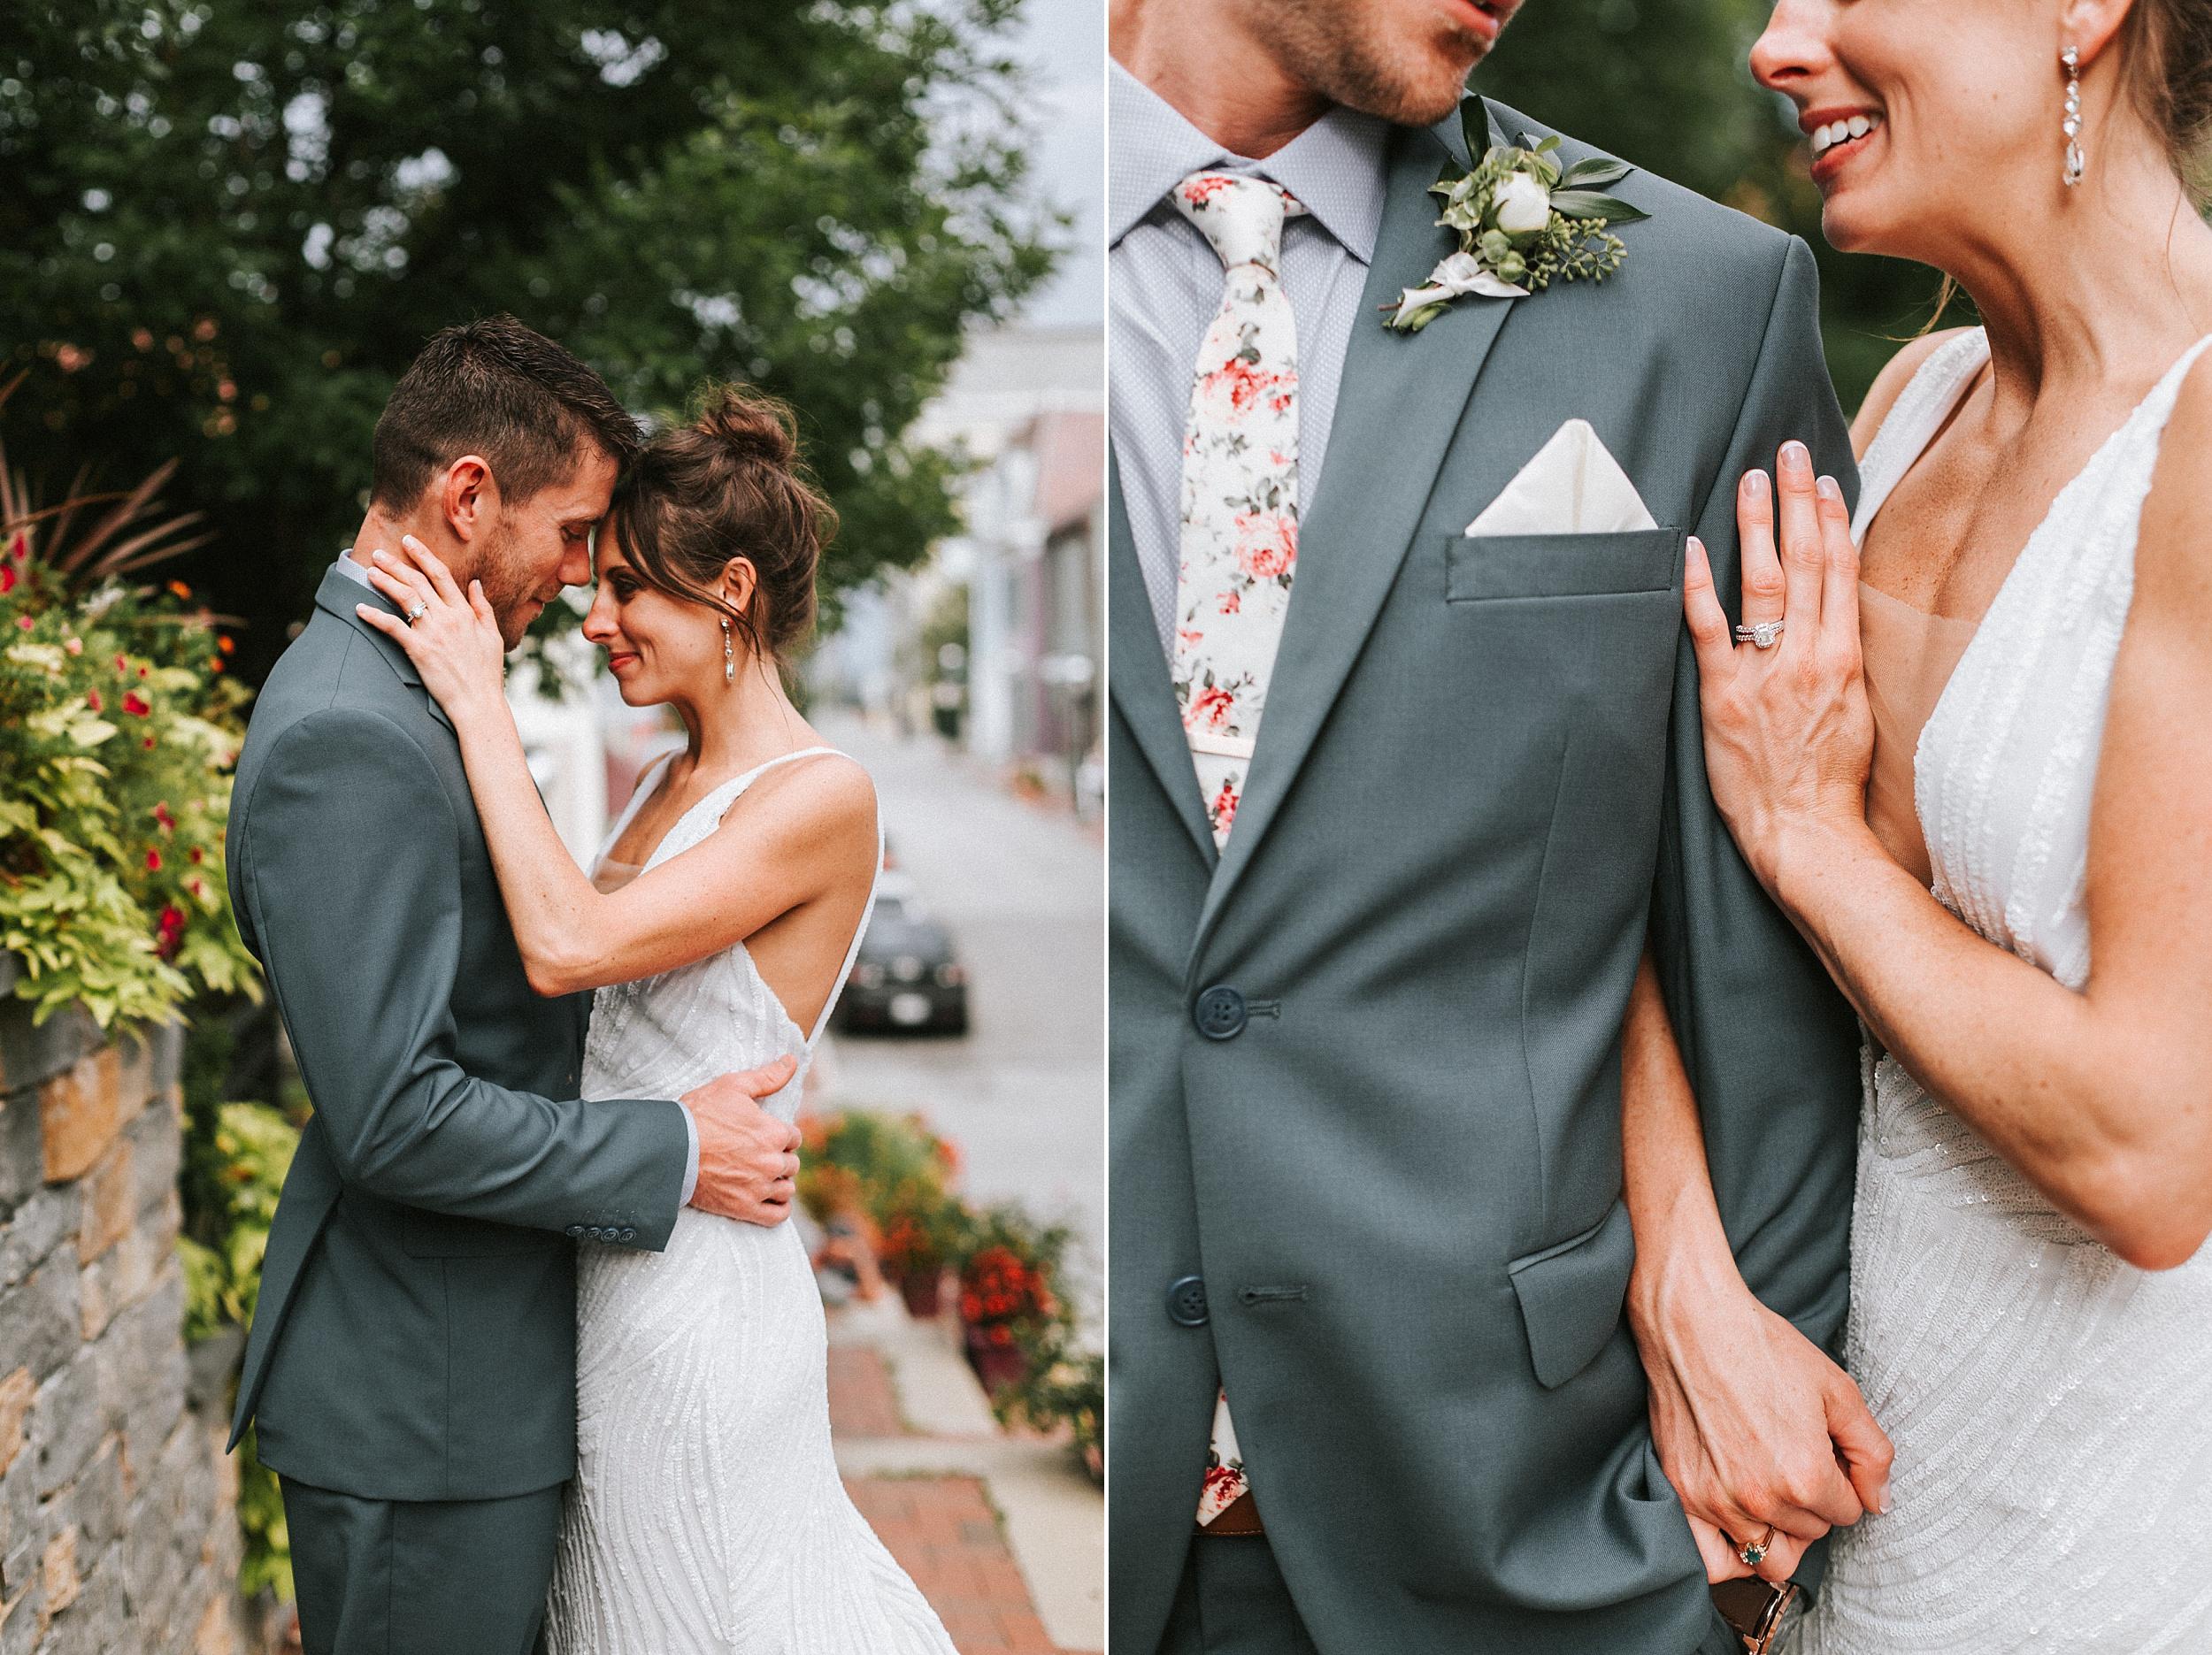 Brooke Townsend Photography - Cincinnati Wedding Photographer (137 of 170).jpg